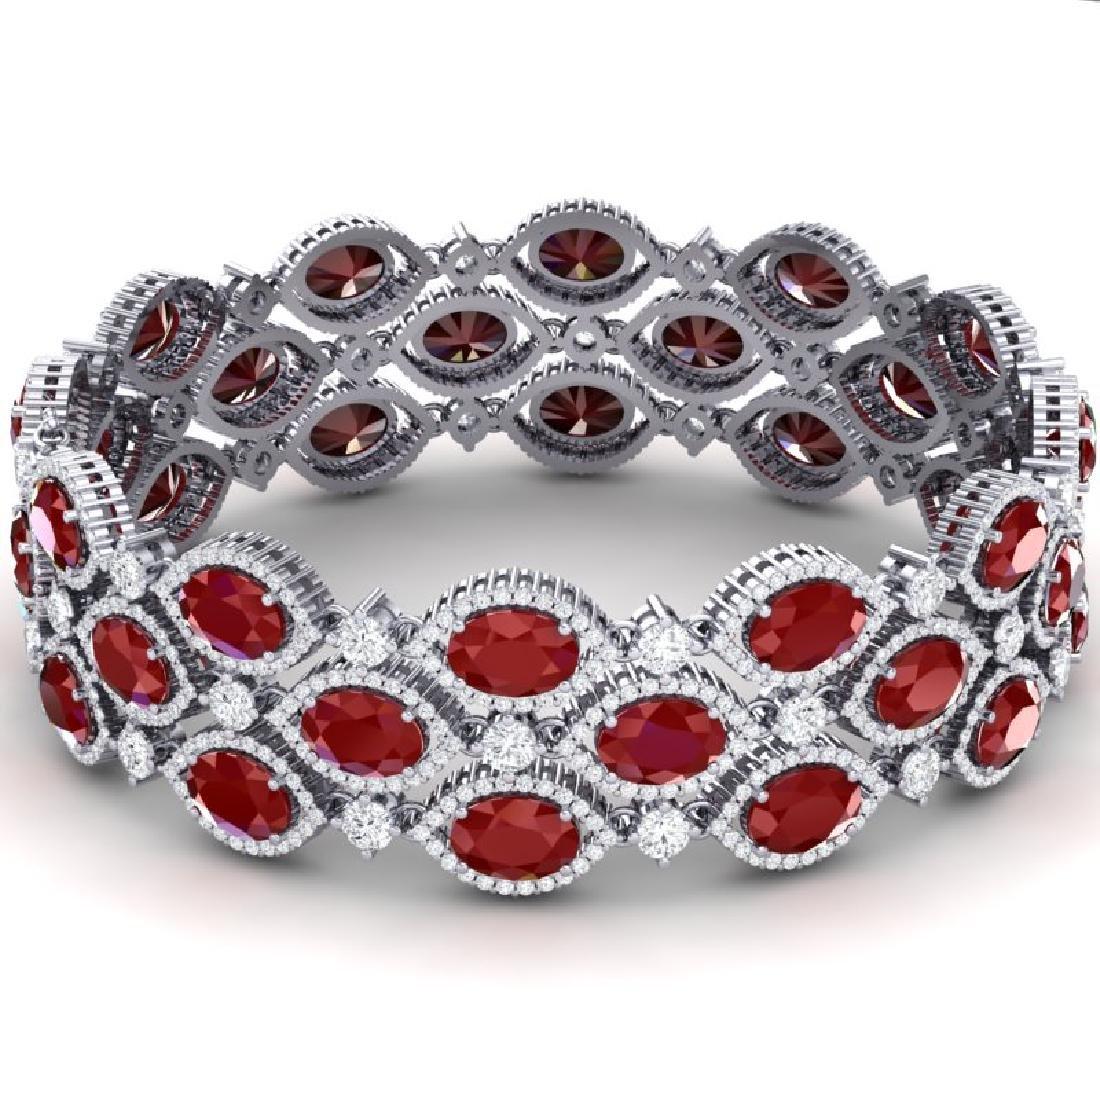 47.84 CTW Royalty Ruby & VS Diamond Bracelet 18K White - 3